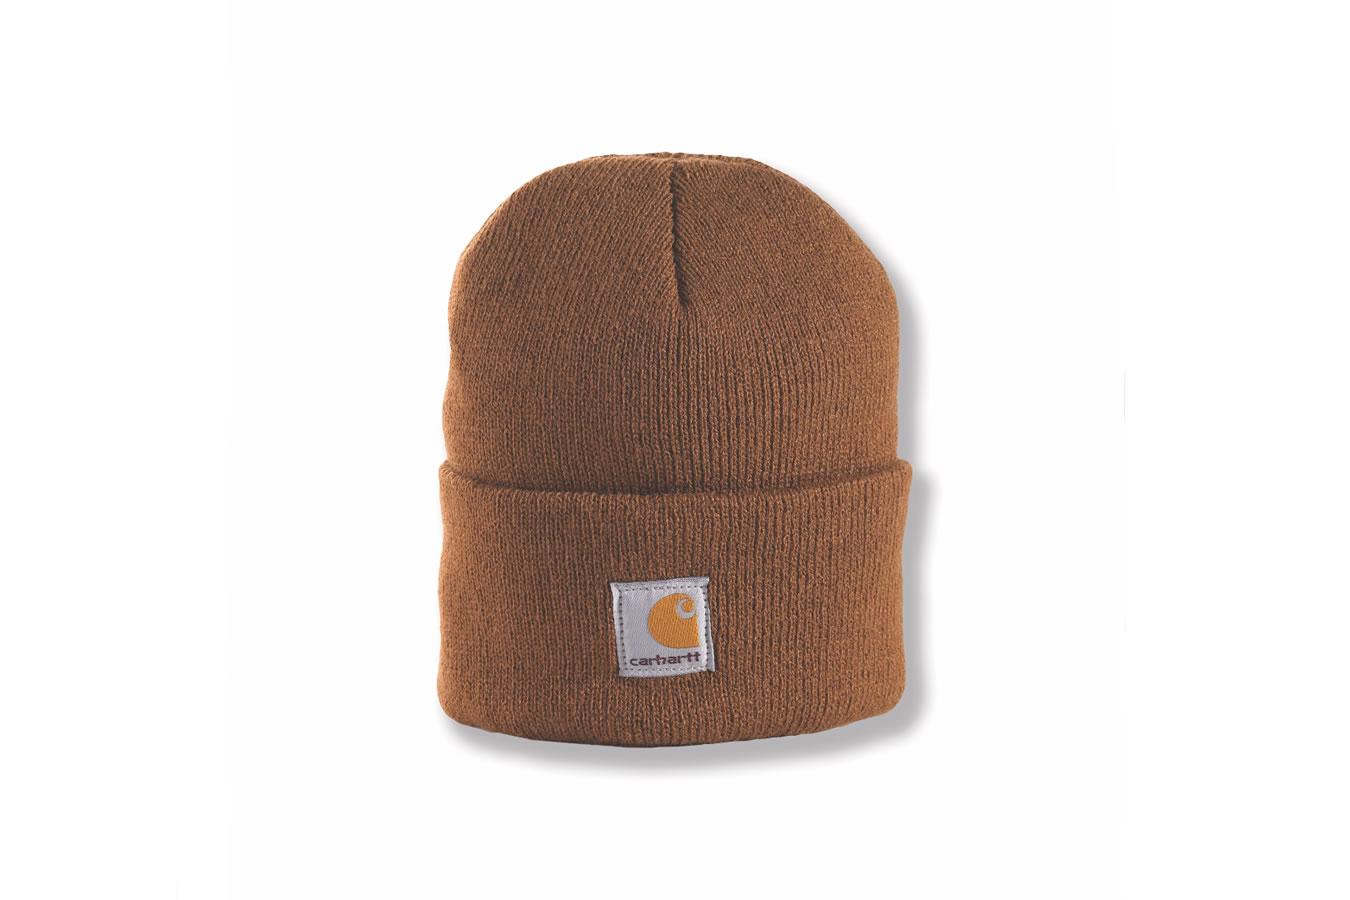 30f189dfc4c78 Carhartt Kids Acrylic Watch Hat